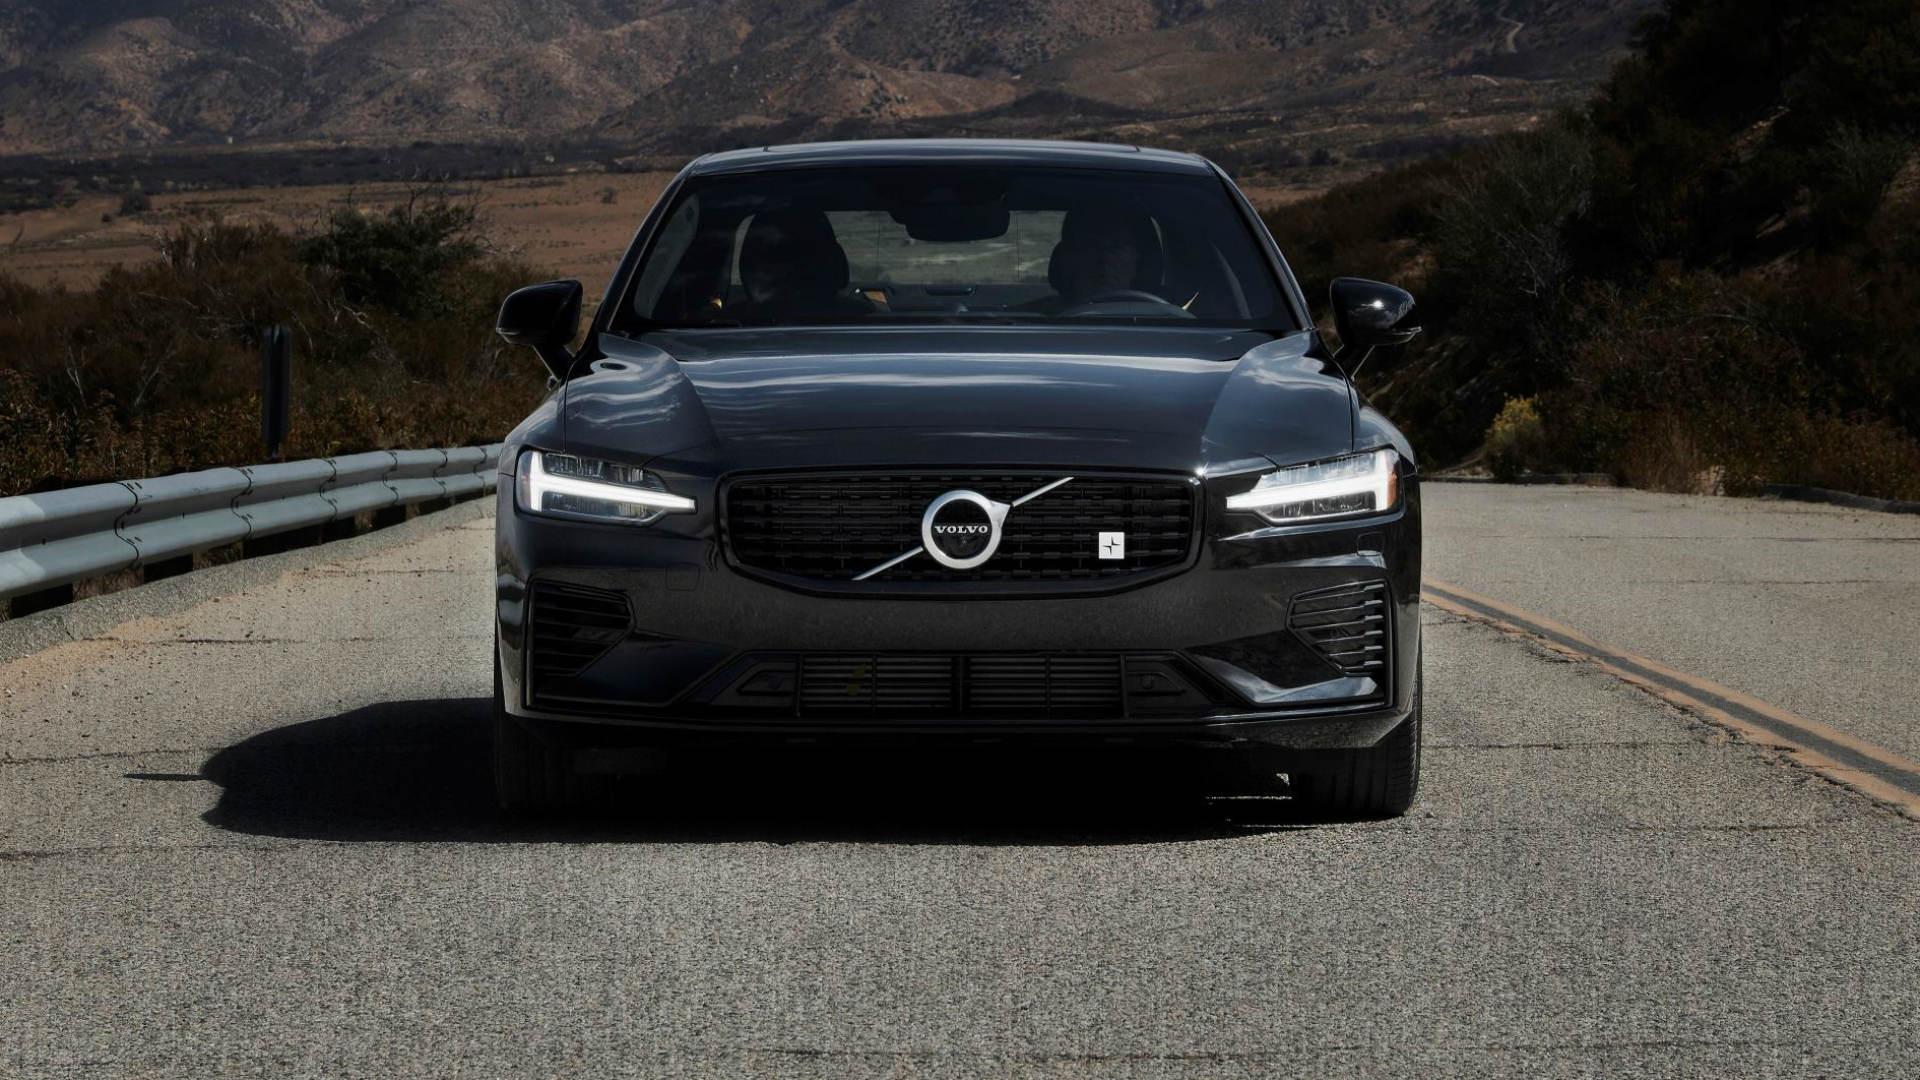 Volvo S60 T8 Twin Engine Polestar Engineered